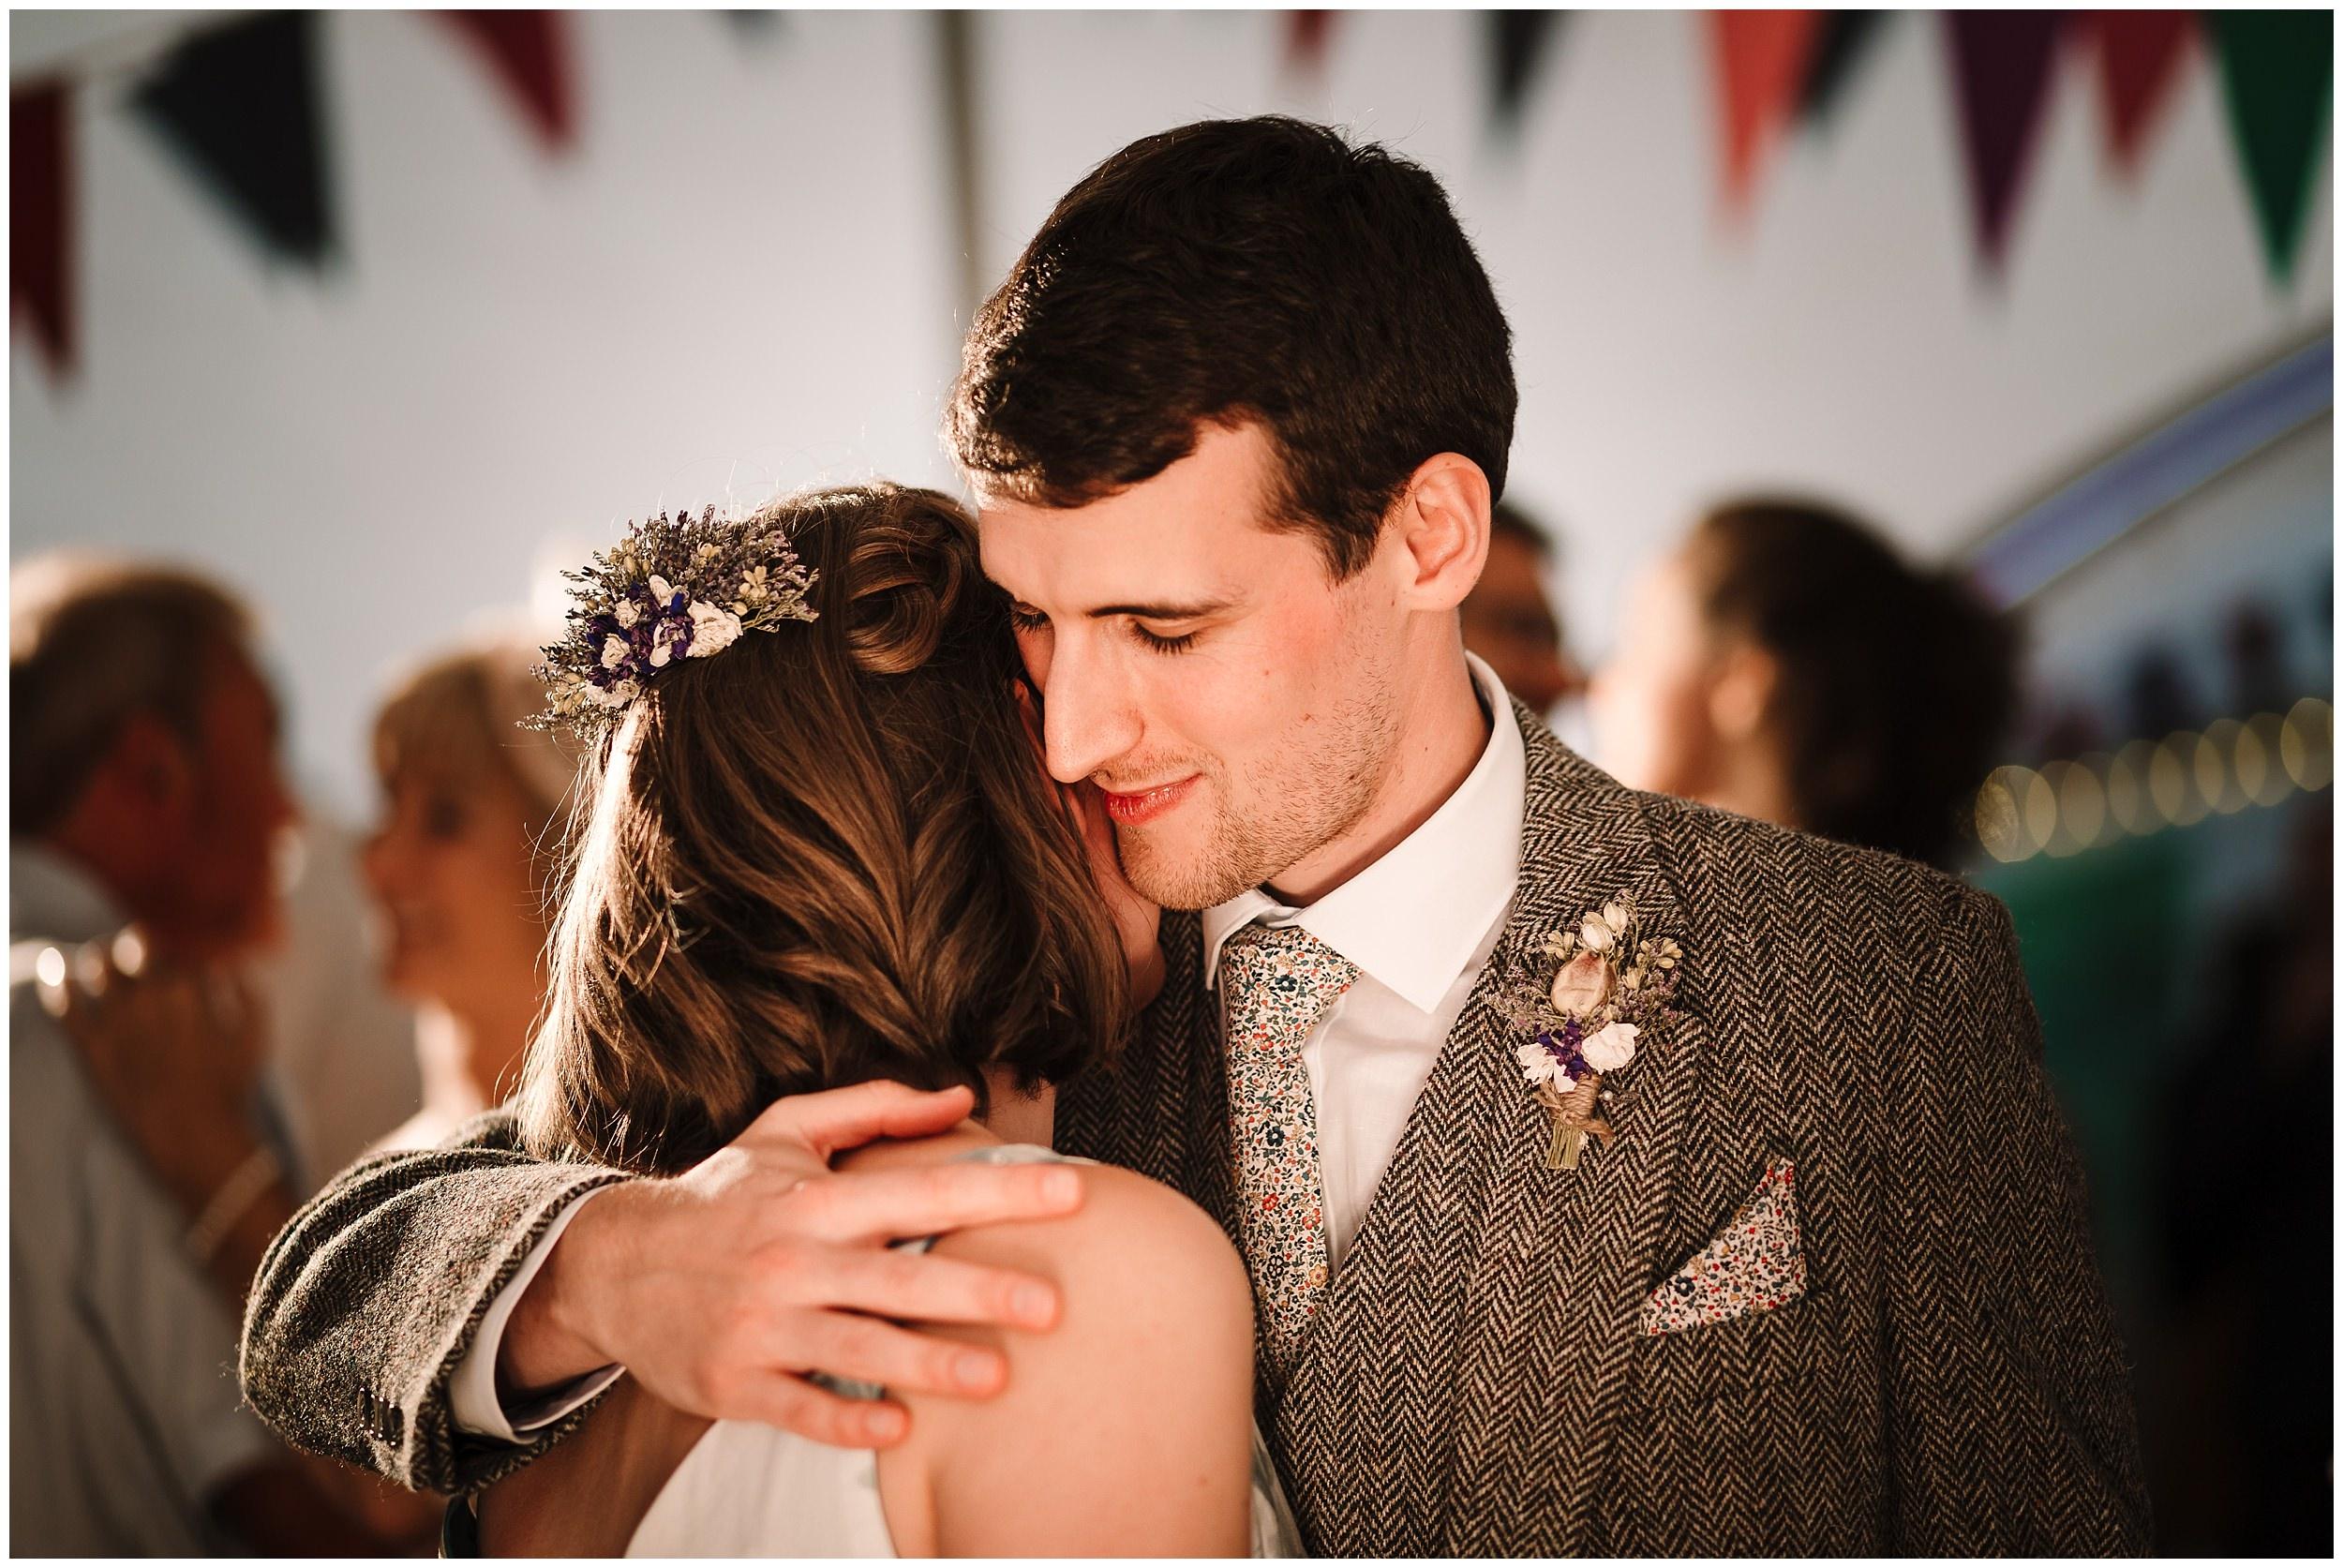 YORKSHIRE OUTDOOR WEDDING PHOTOGRAPHER LUCY ALEX_0040.jpg